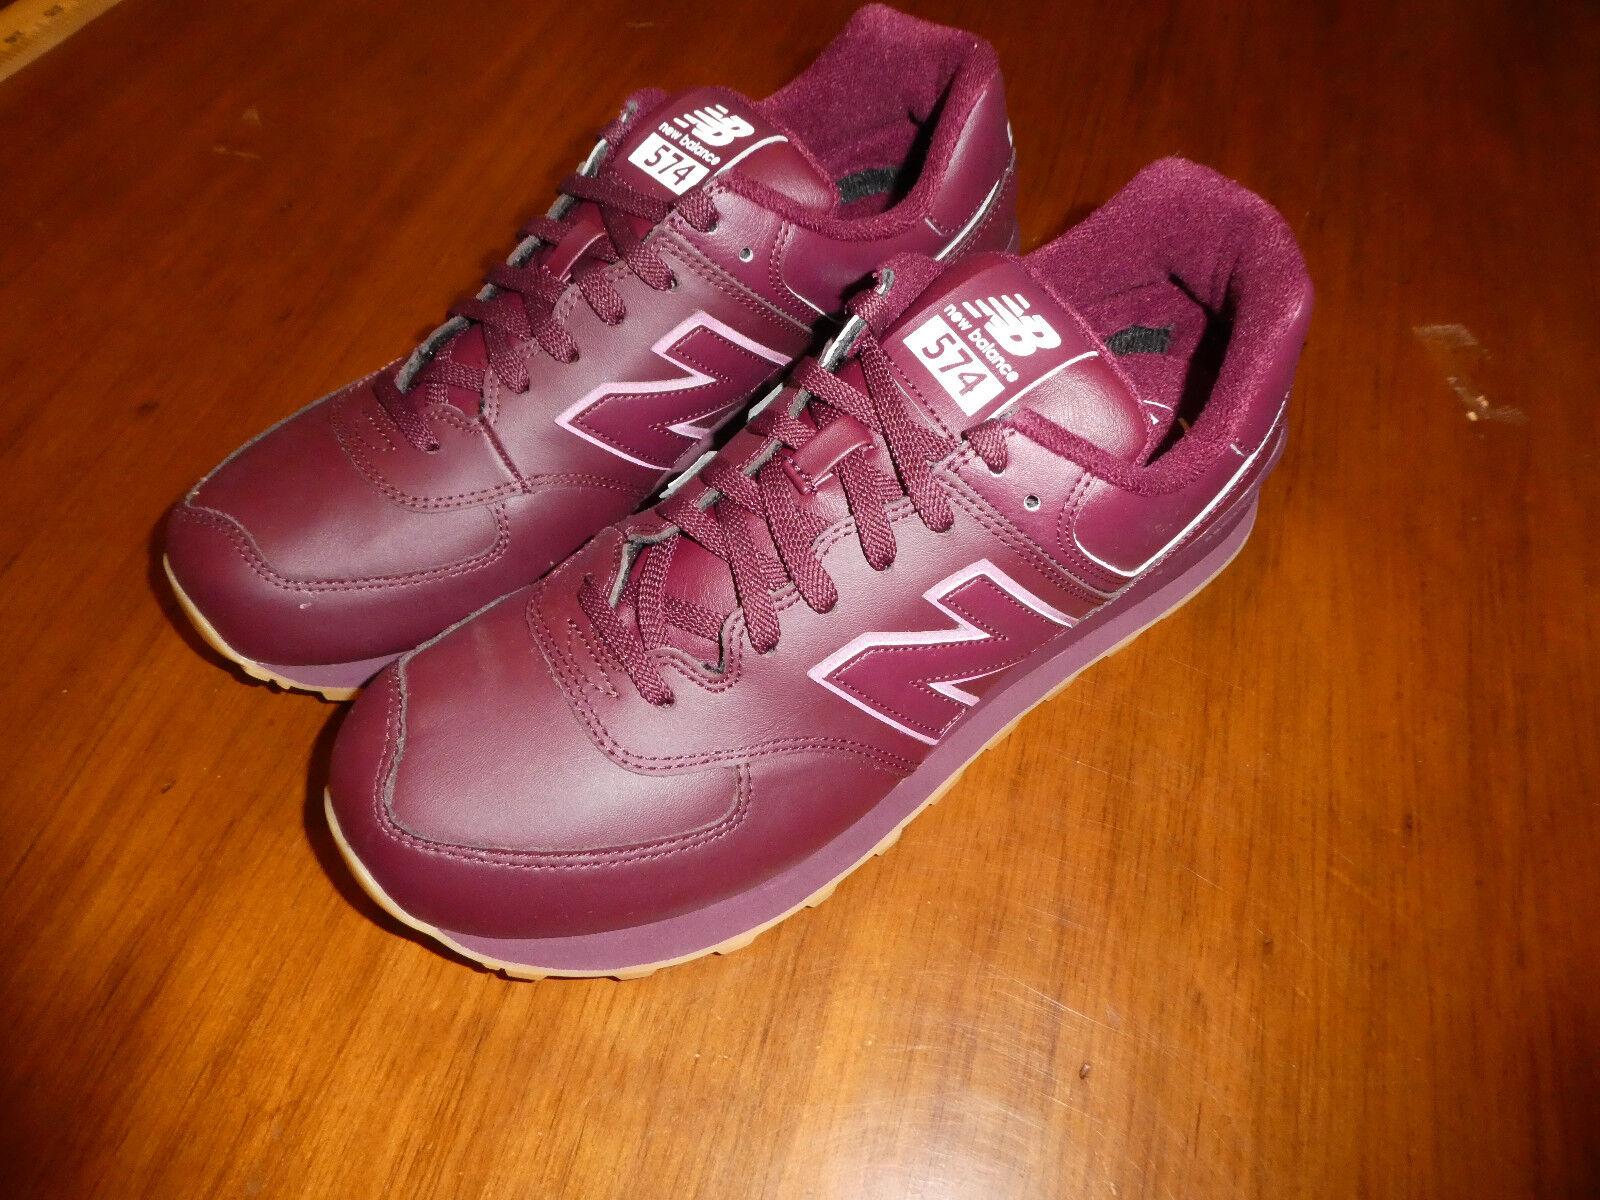 Mens New Balance NB574AAB 9.5 Shoes 574  Size 9.5 NB574AAB burgundy gum cb84b8